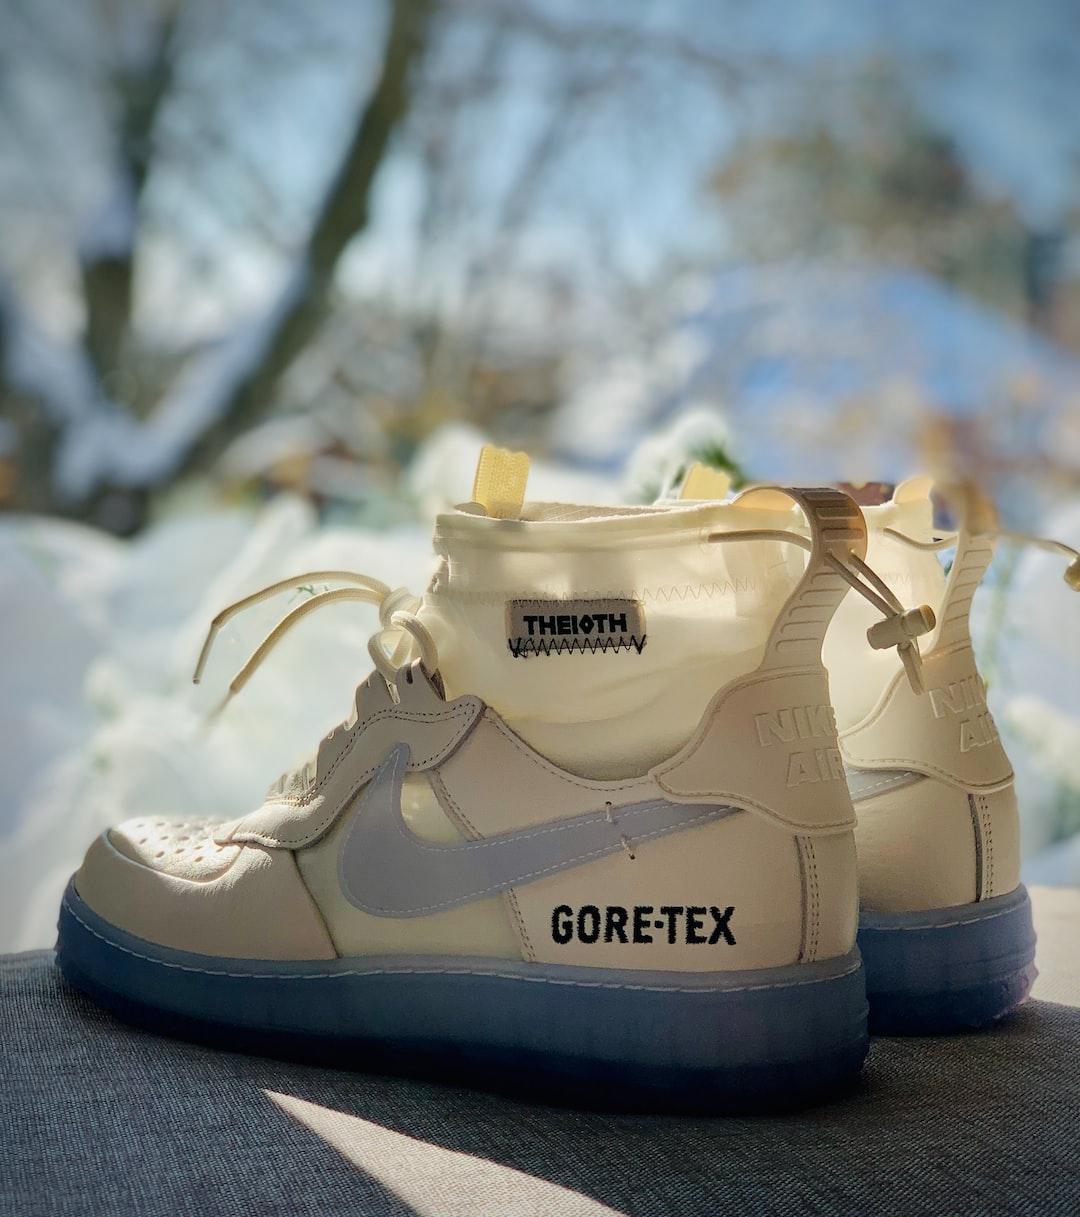 Winter-ready